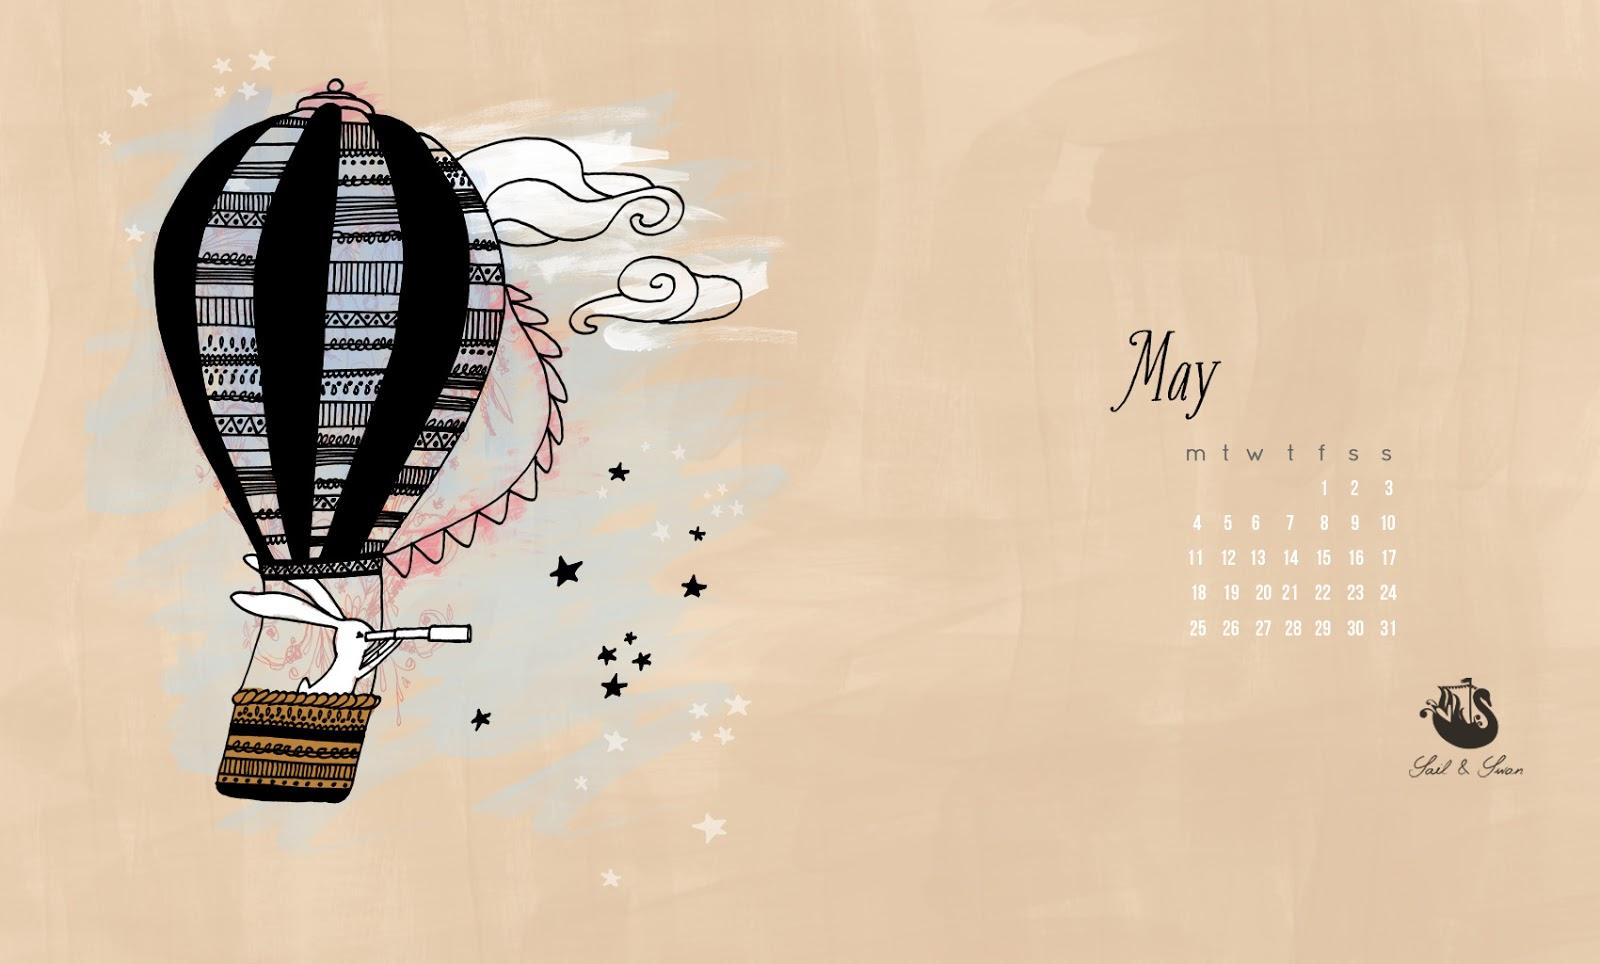 sail and swan rabbit wallpaper desktop background childrens illustration